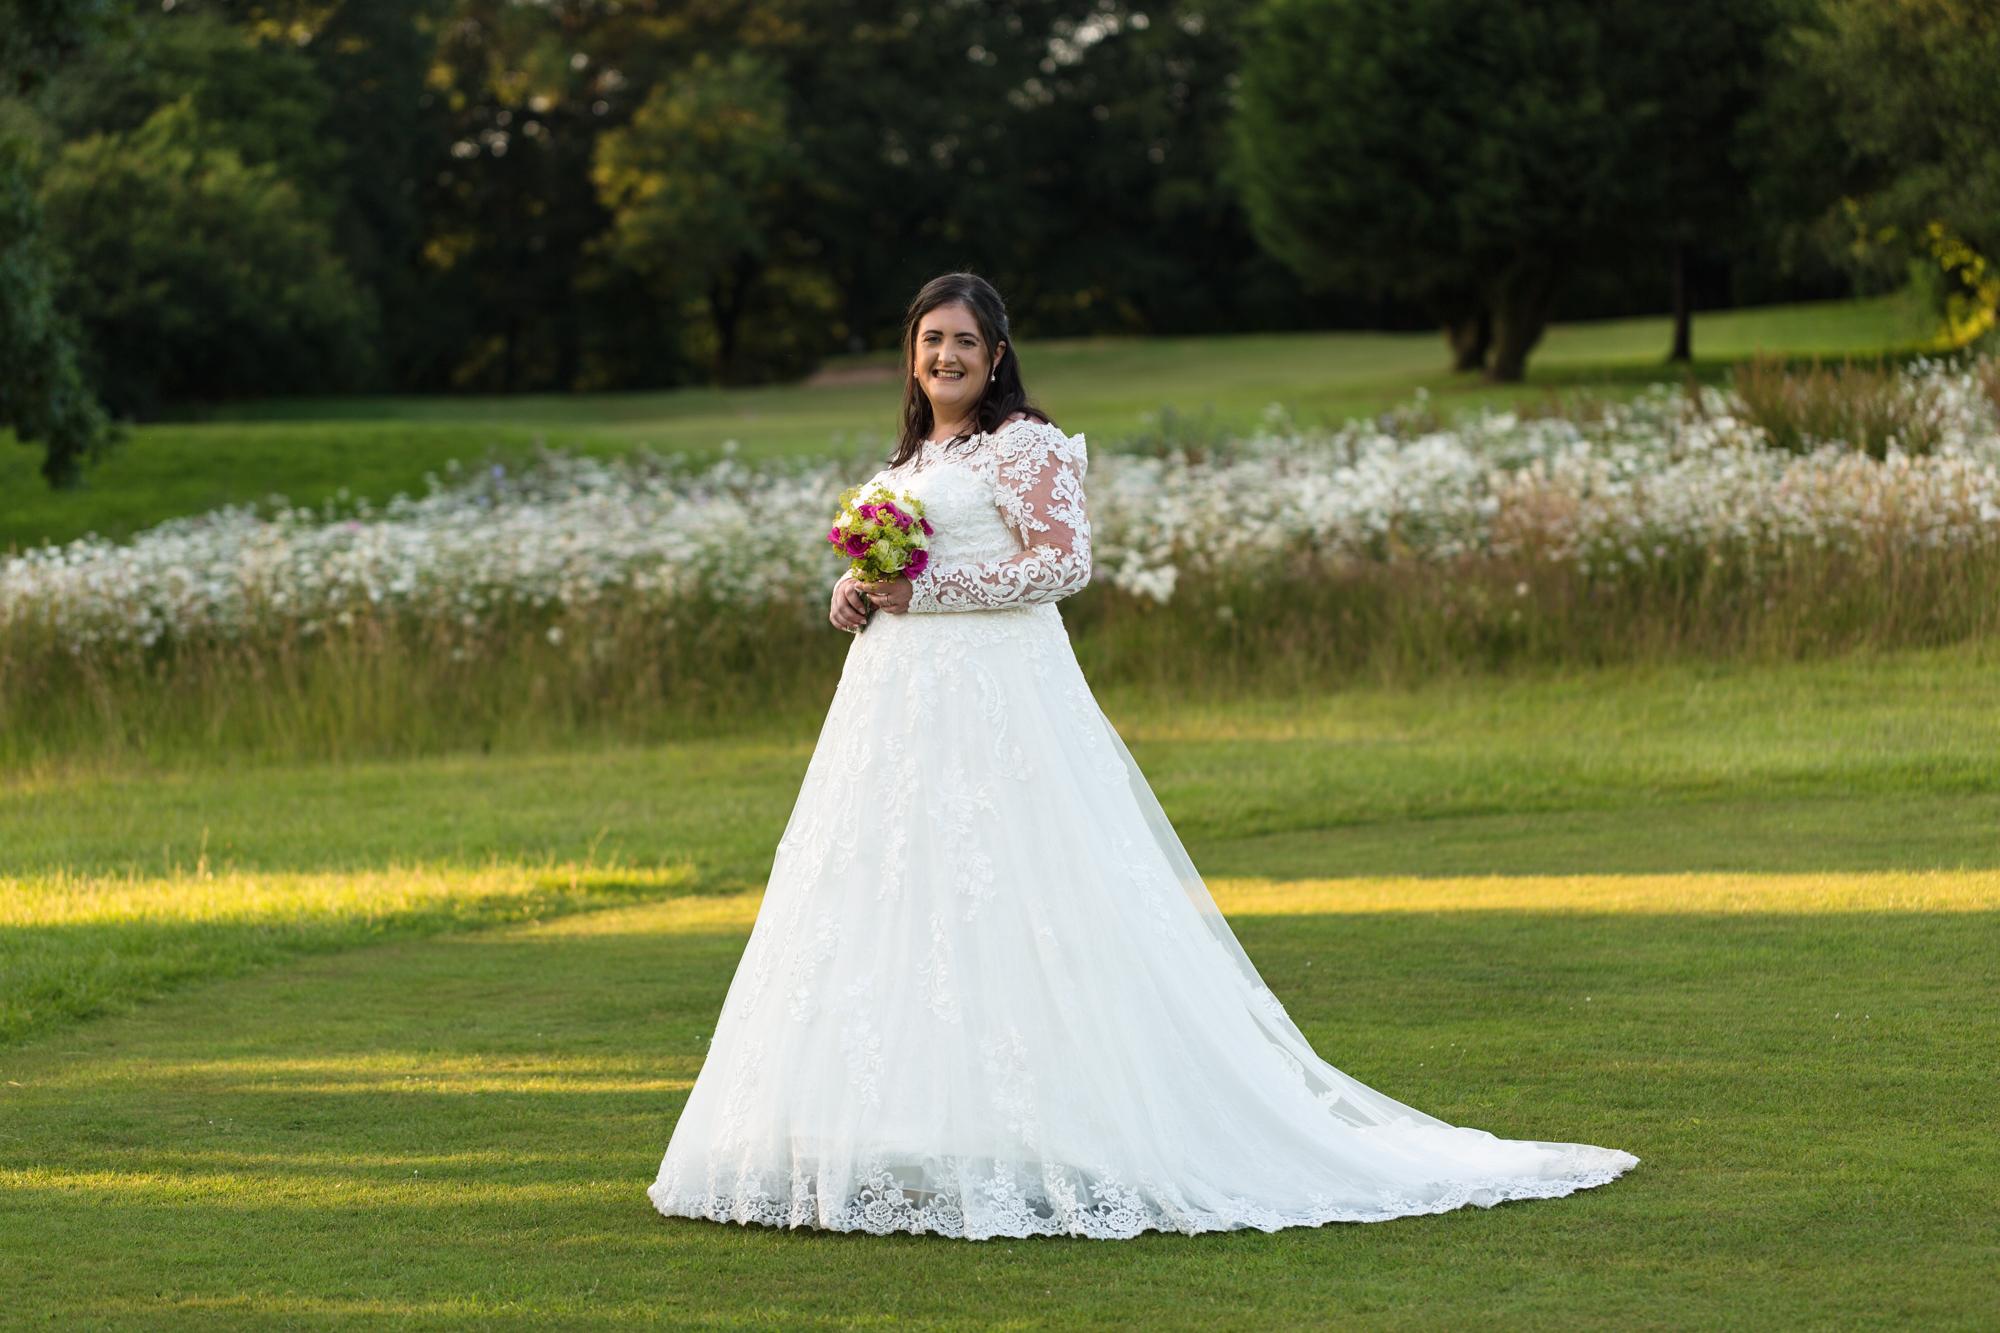 bride at Ridgeway golf club Caerphilly Mountain, Thornhill